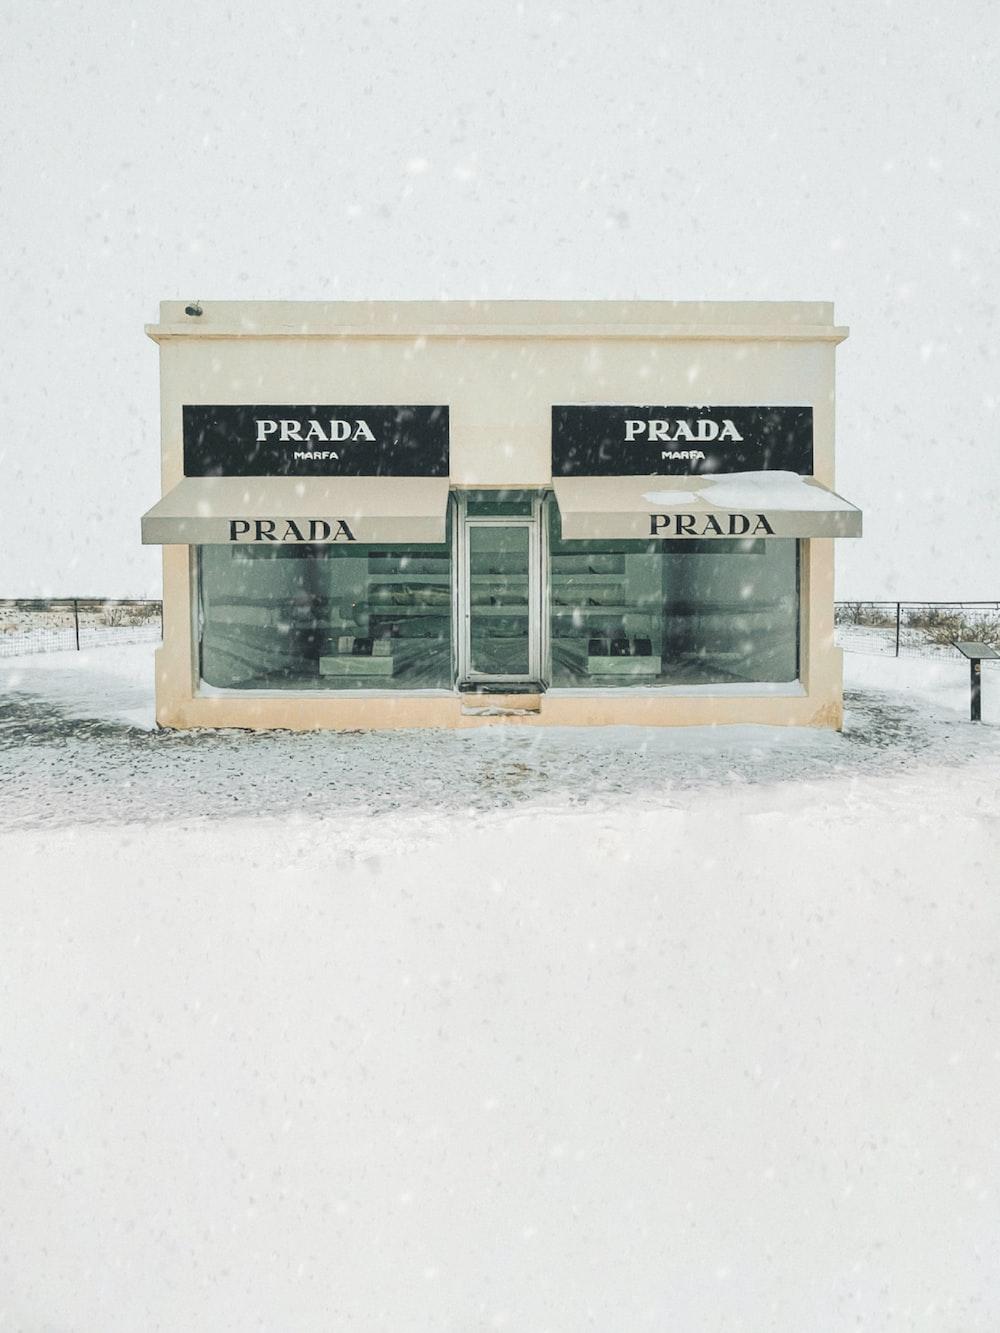 white wooden signage on white snow